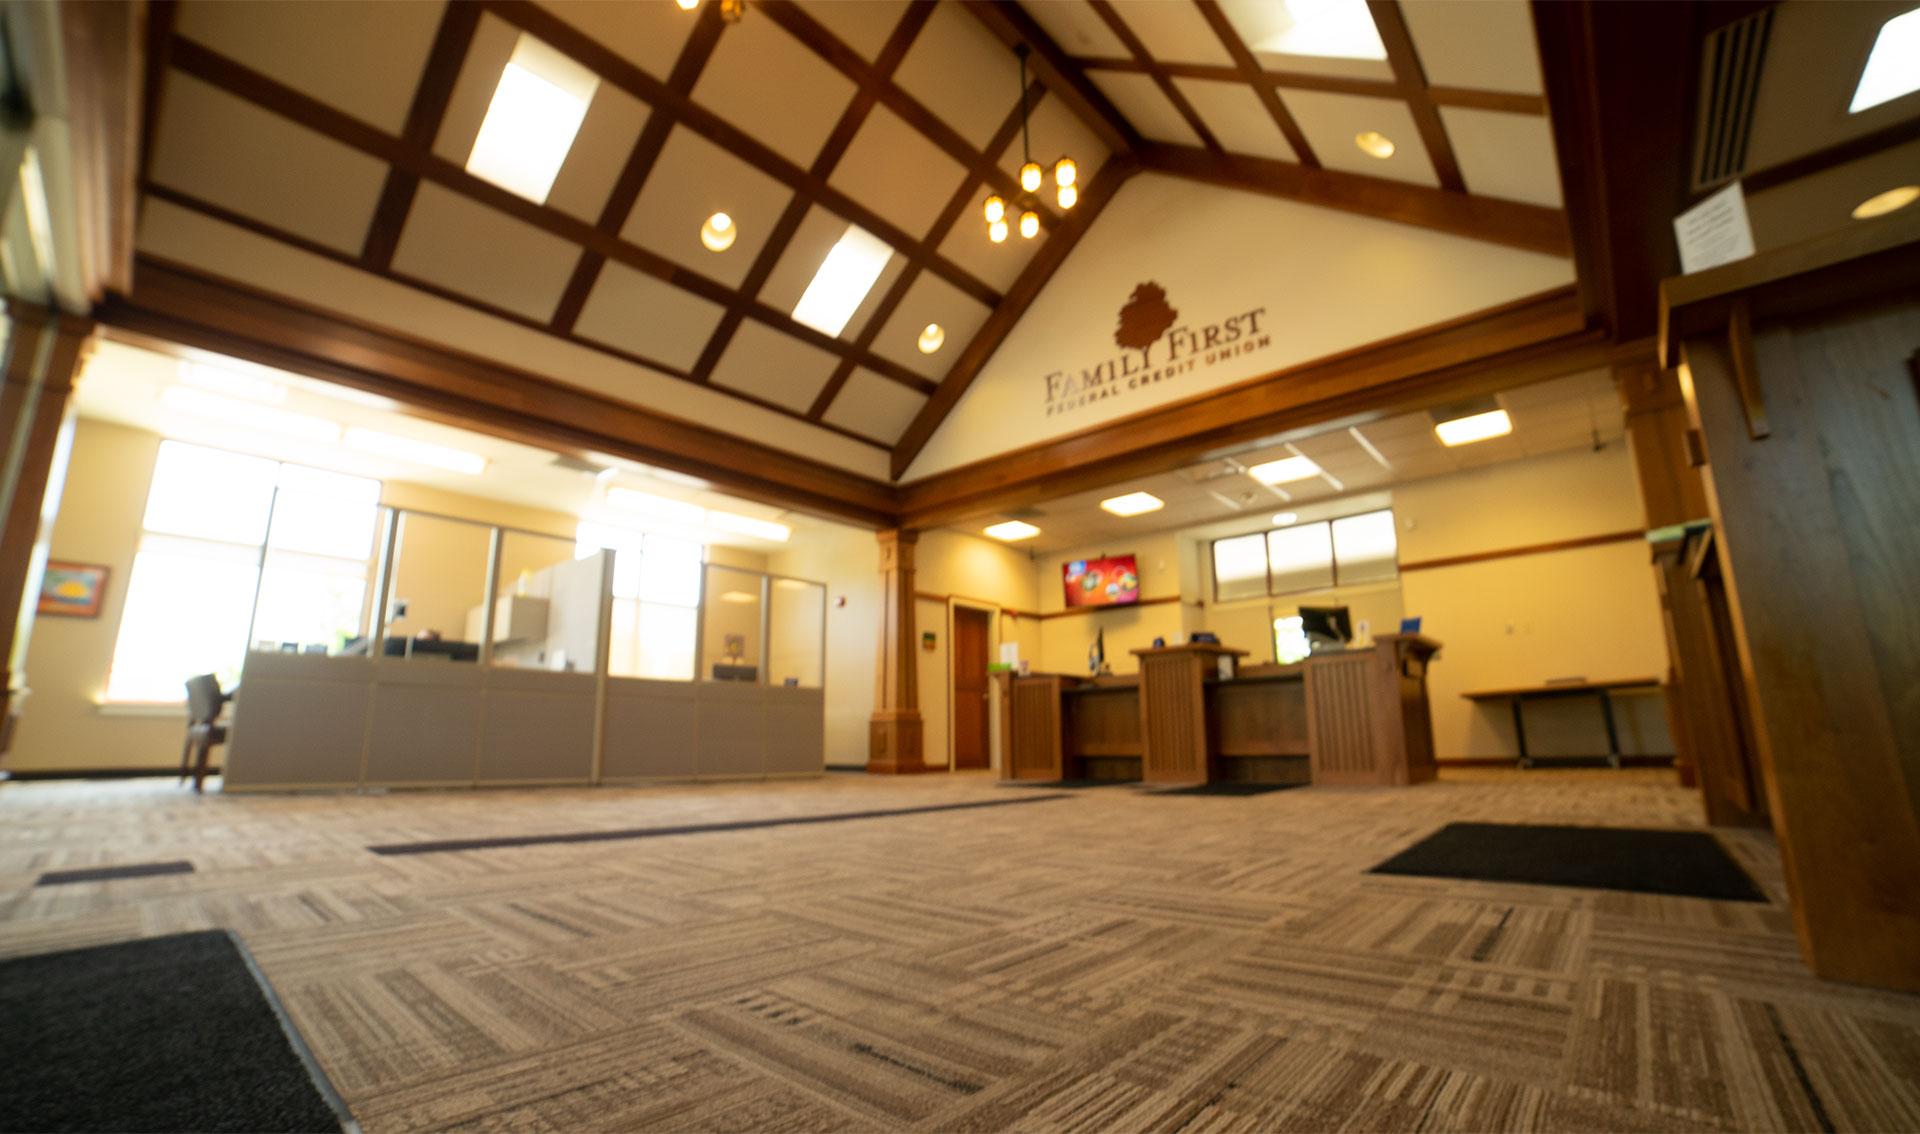 east rochester branch interior